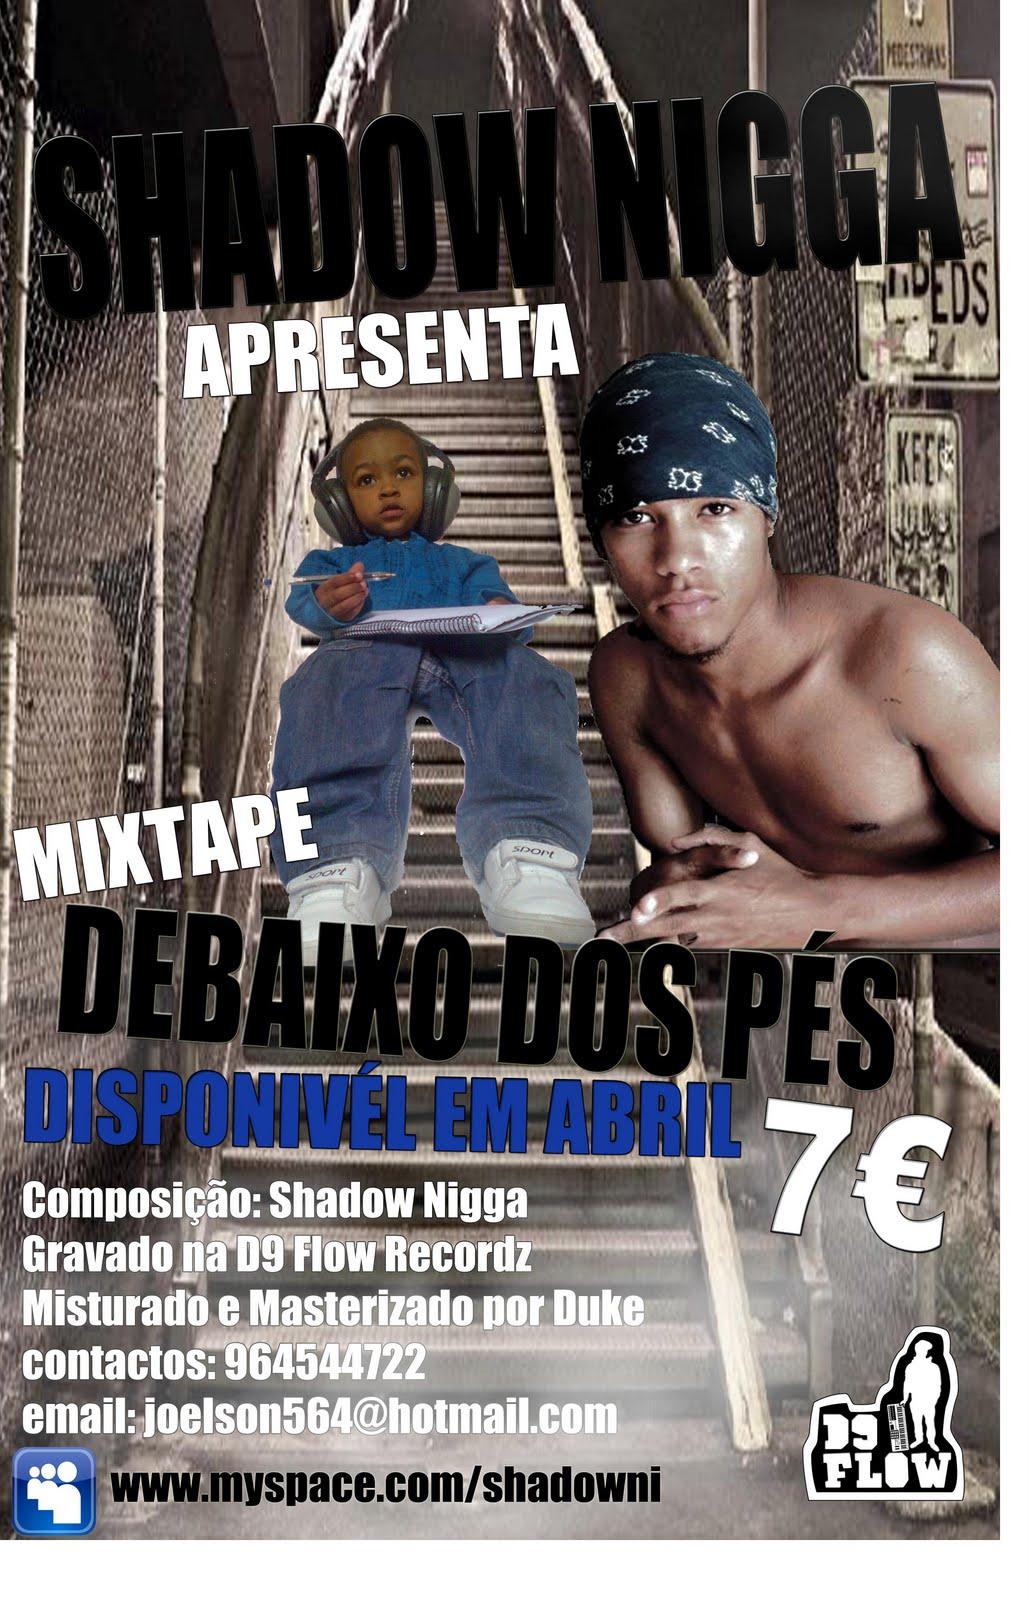 http://1.bp.blogspot.com/_V3PkQSeERmo/S7MWmAn7OvI/AAAAAAAABGE/XRgk0dsD-wQ/s1600/cartaz-mixtape+debaixo+dos+pes+%28shadow+nigga%29.jpg